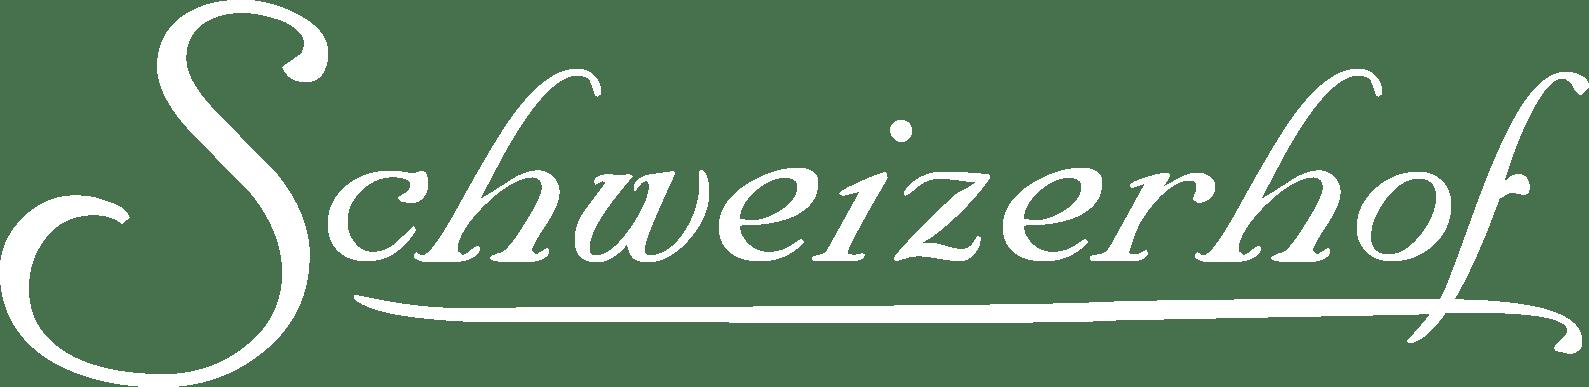 Logo schweizerhof weiss